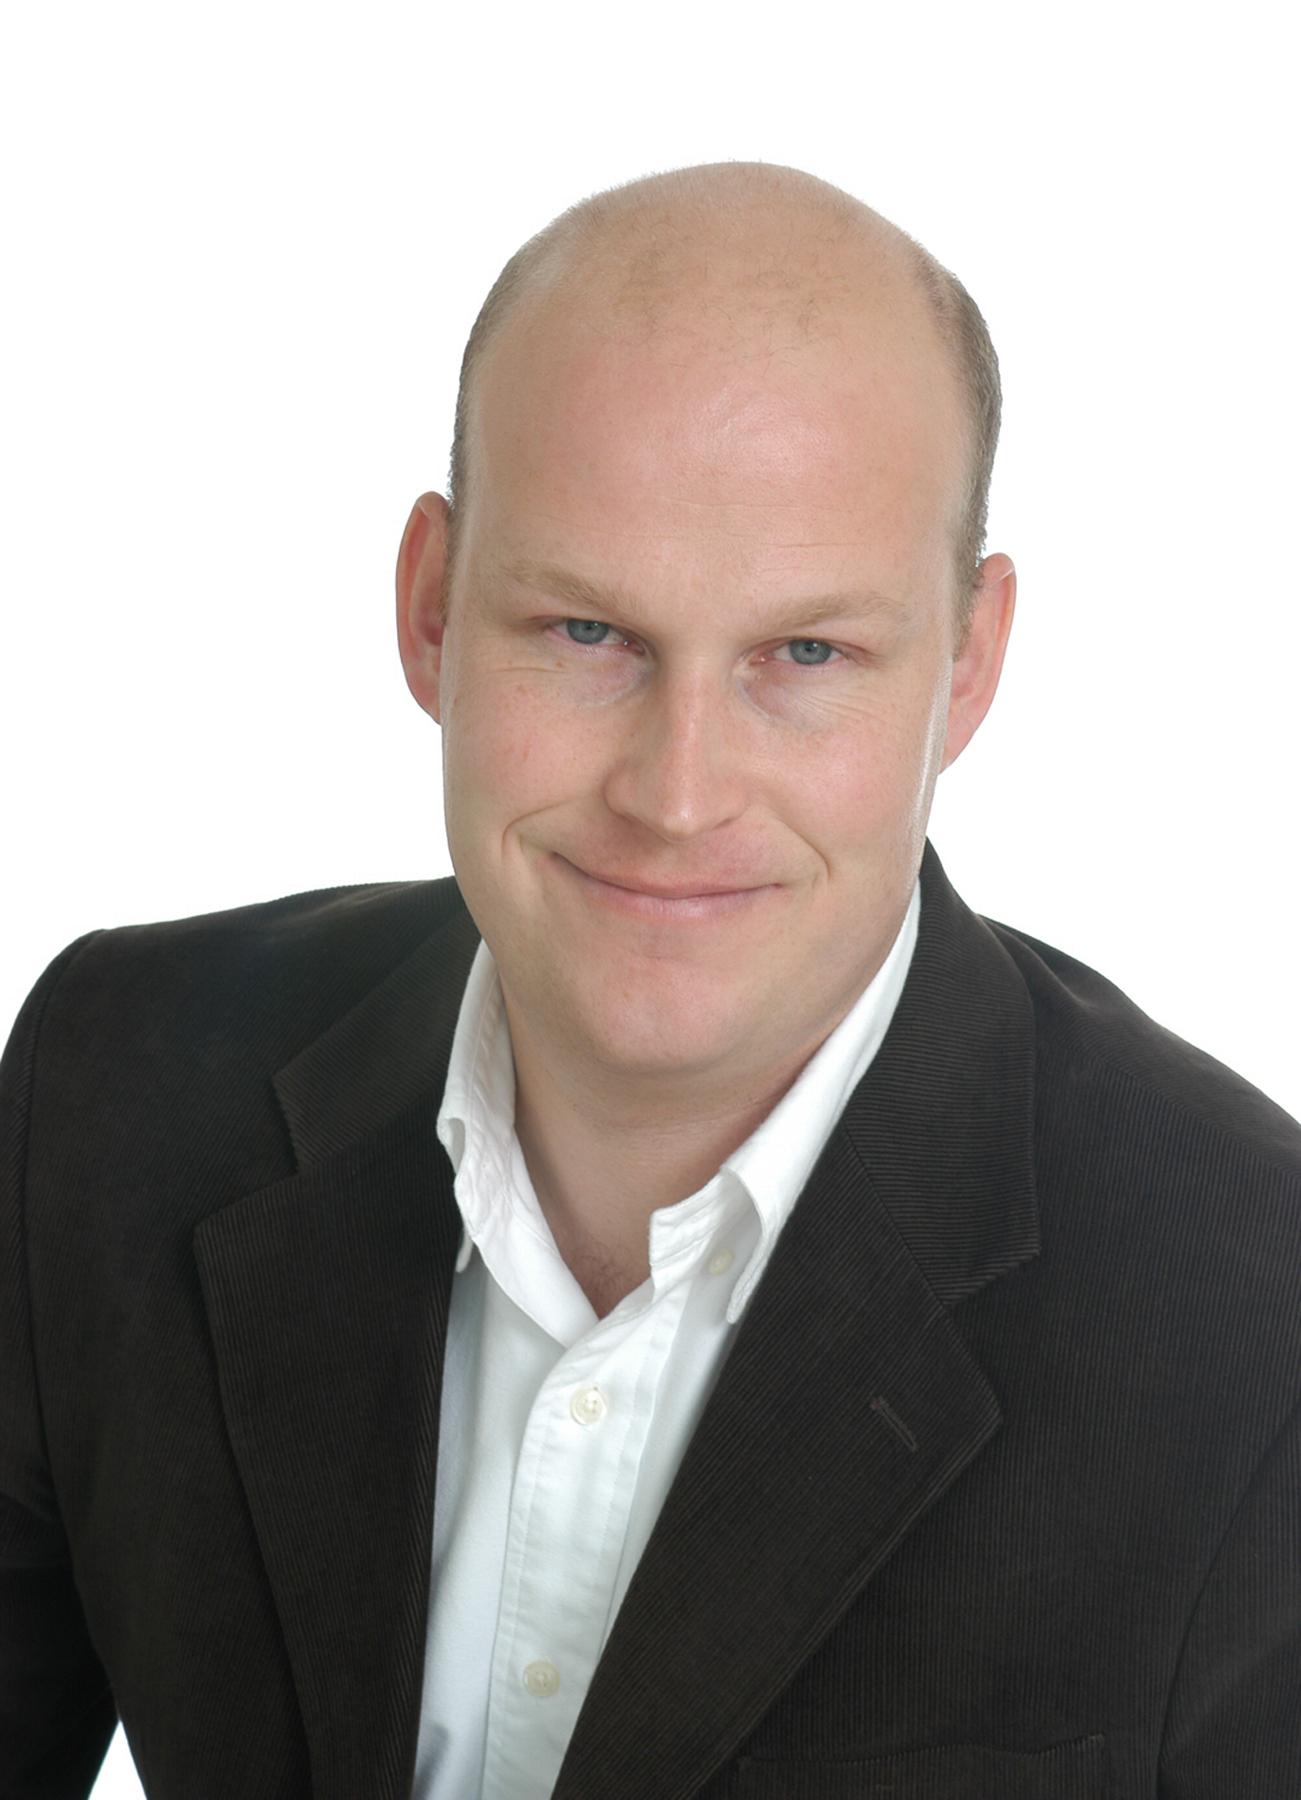 Andrew Norwood, Research VP, Gartner - 1a